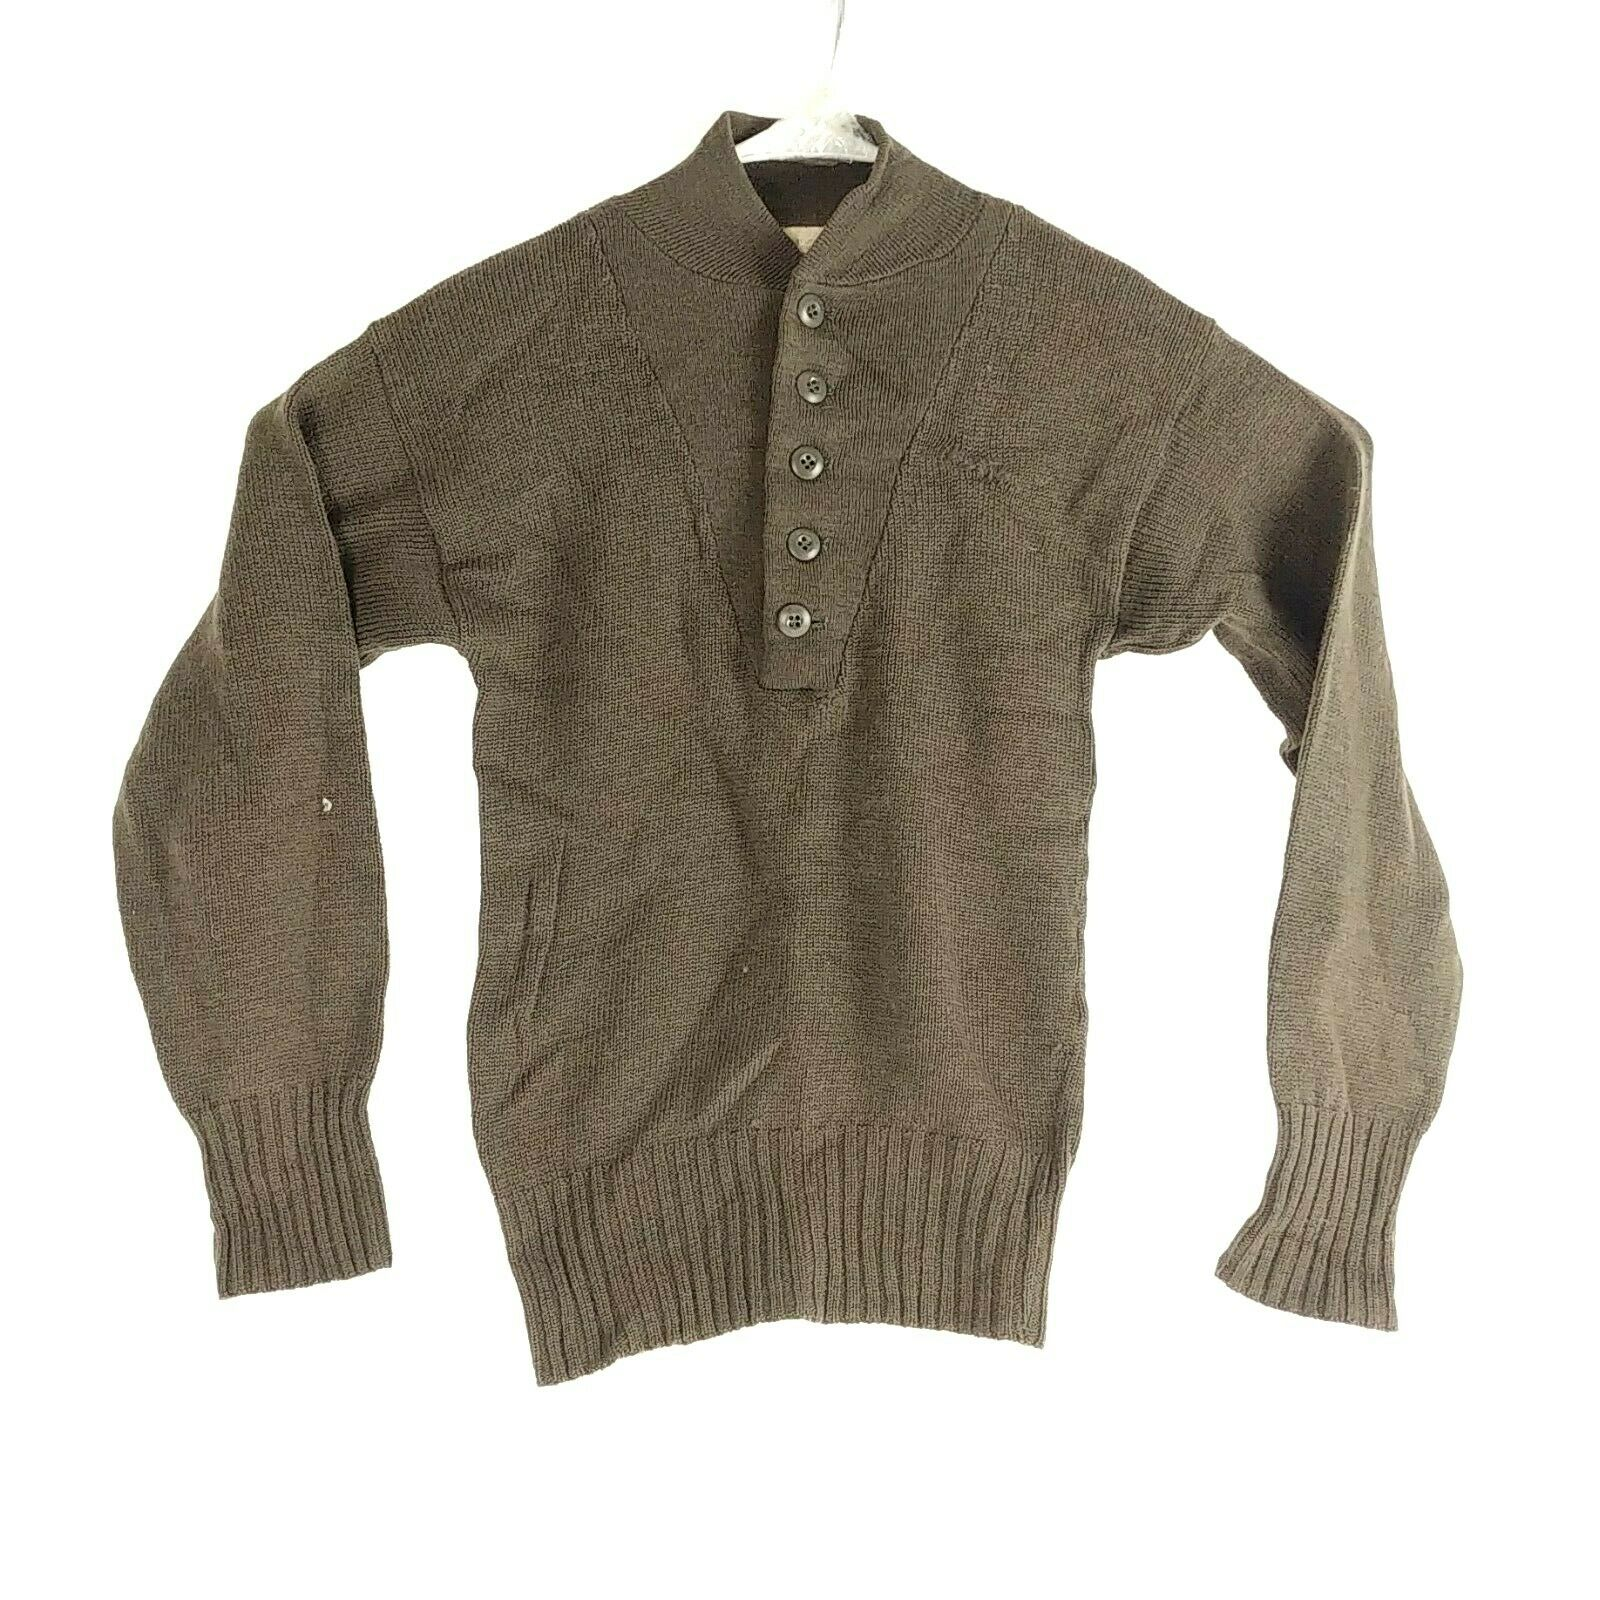 VTG Army Sweater 100% Wool Mens Small S Military OD 34-36 USA SEBO Knitwear D